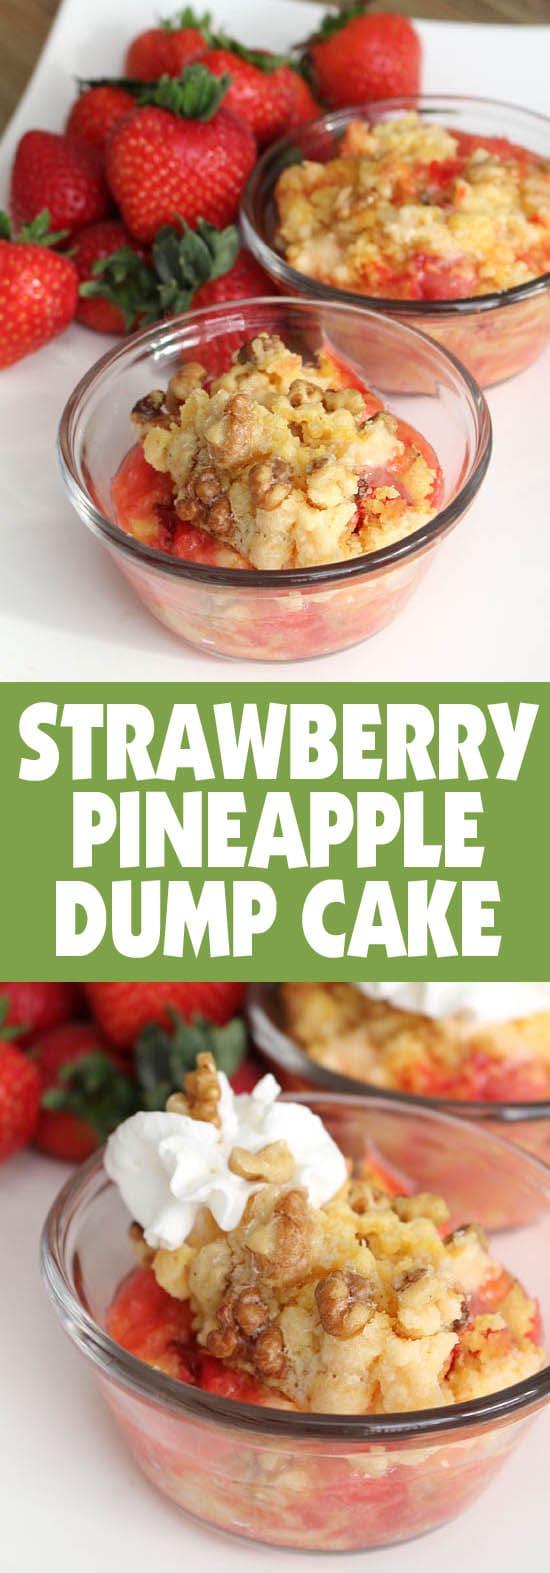 strawberry pineapple dump cake recipe